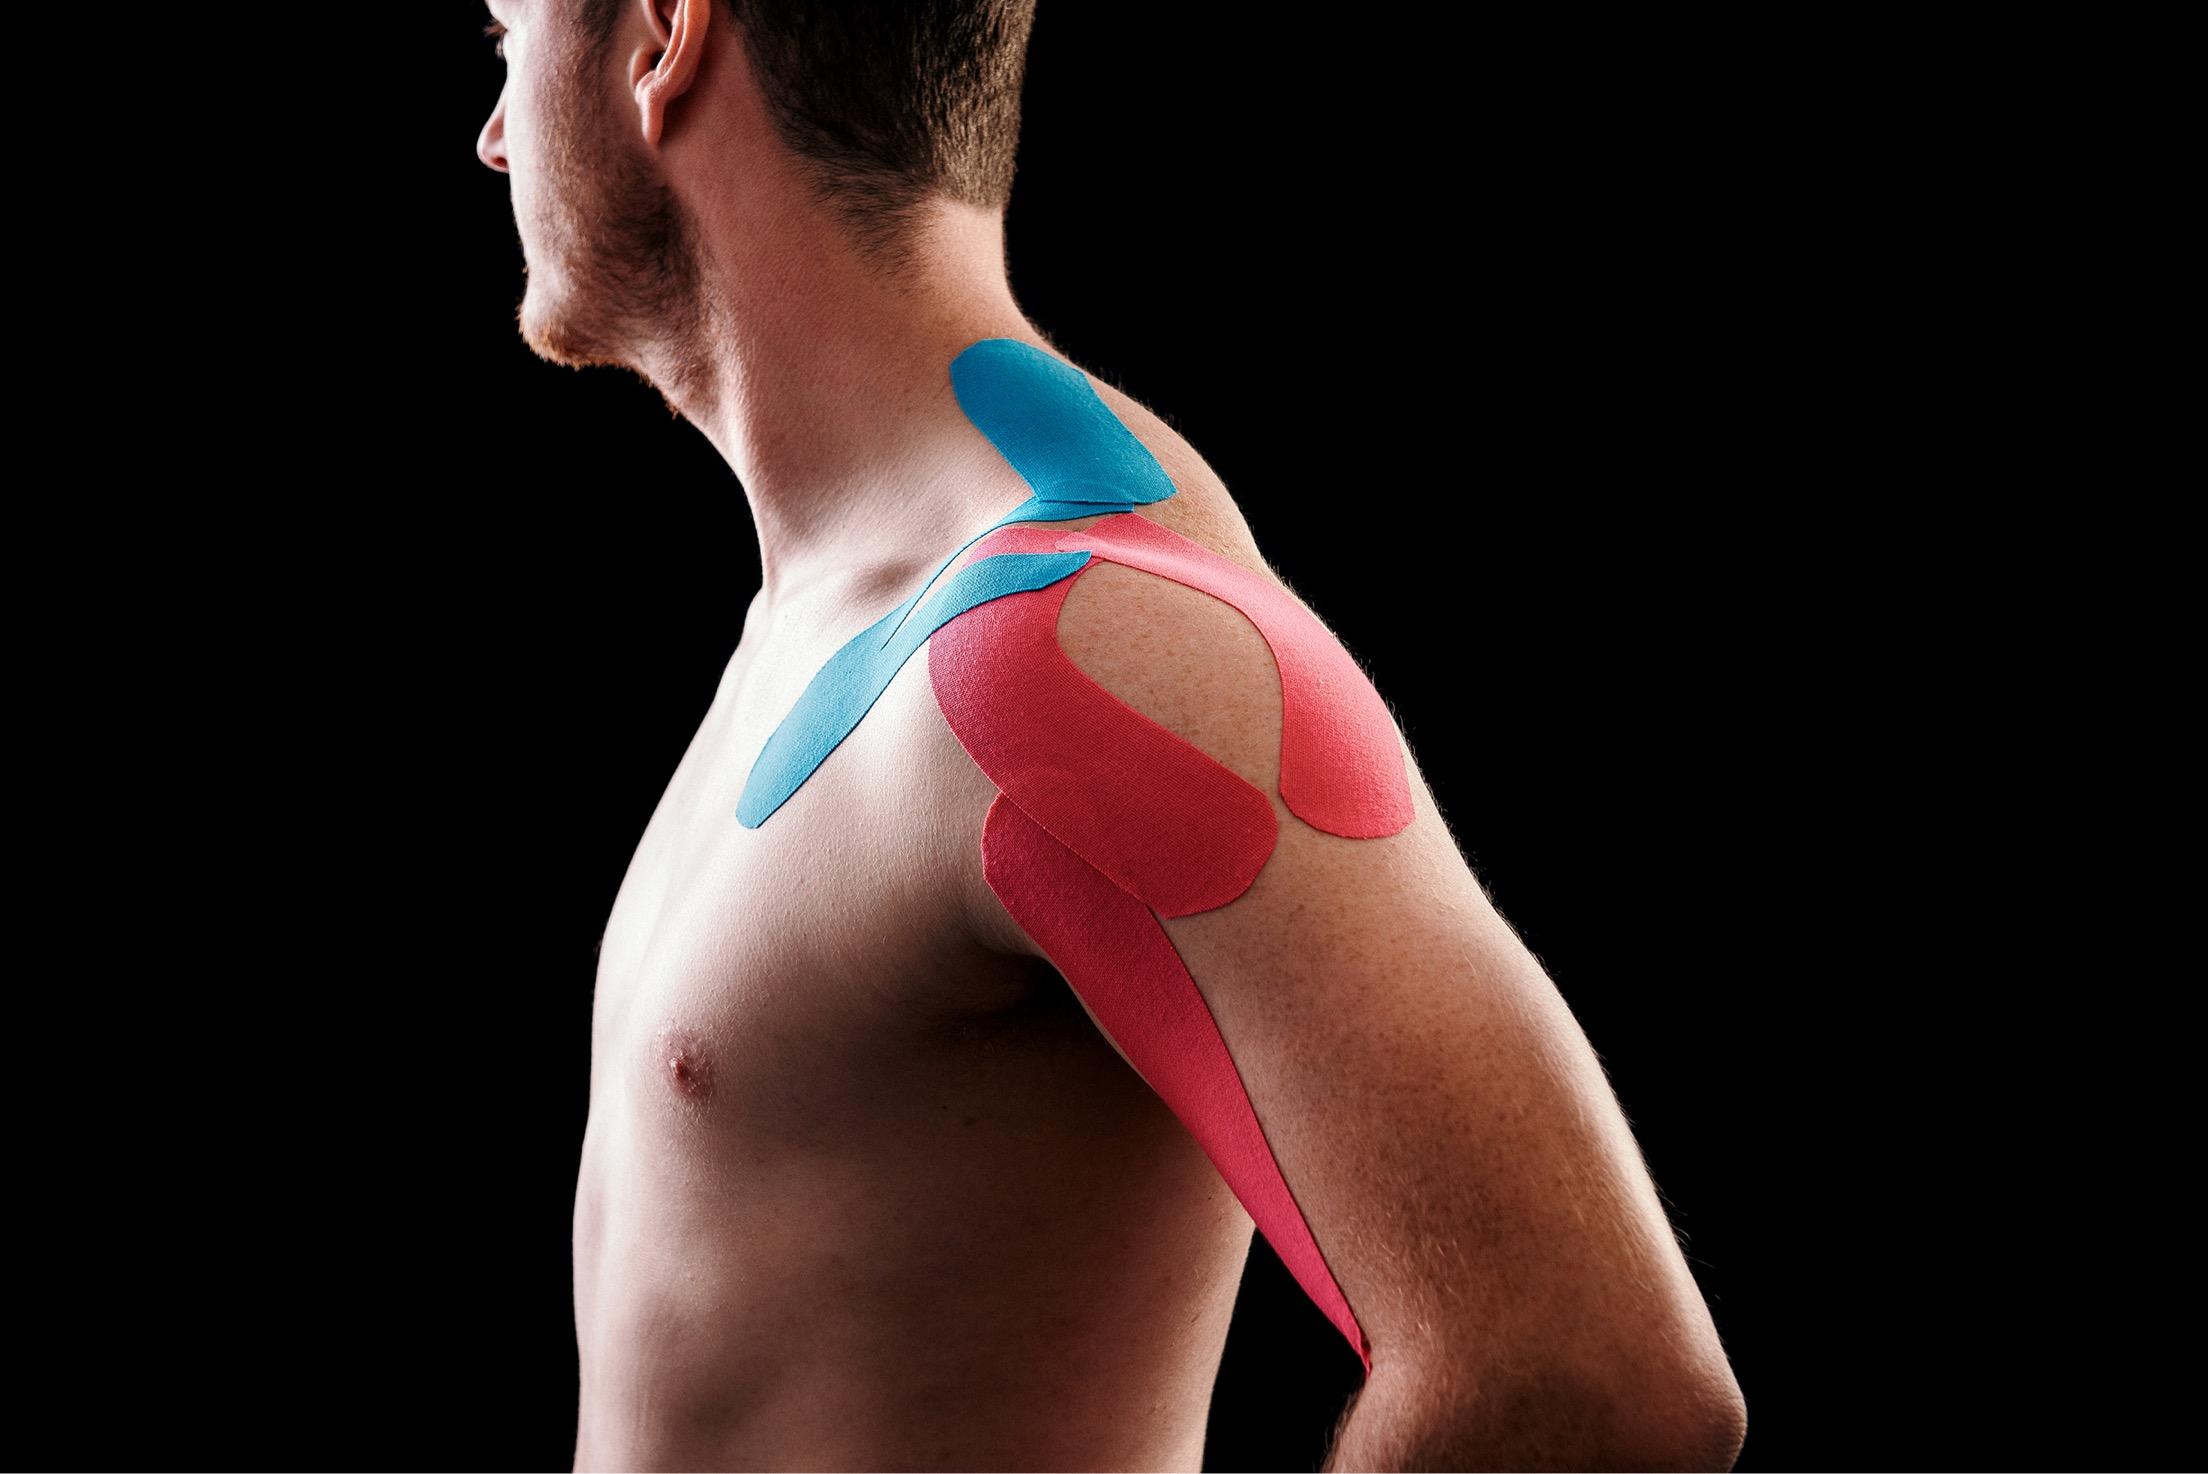 Neurosport Sports Medicine